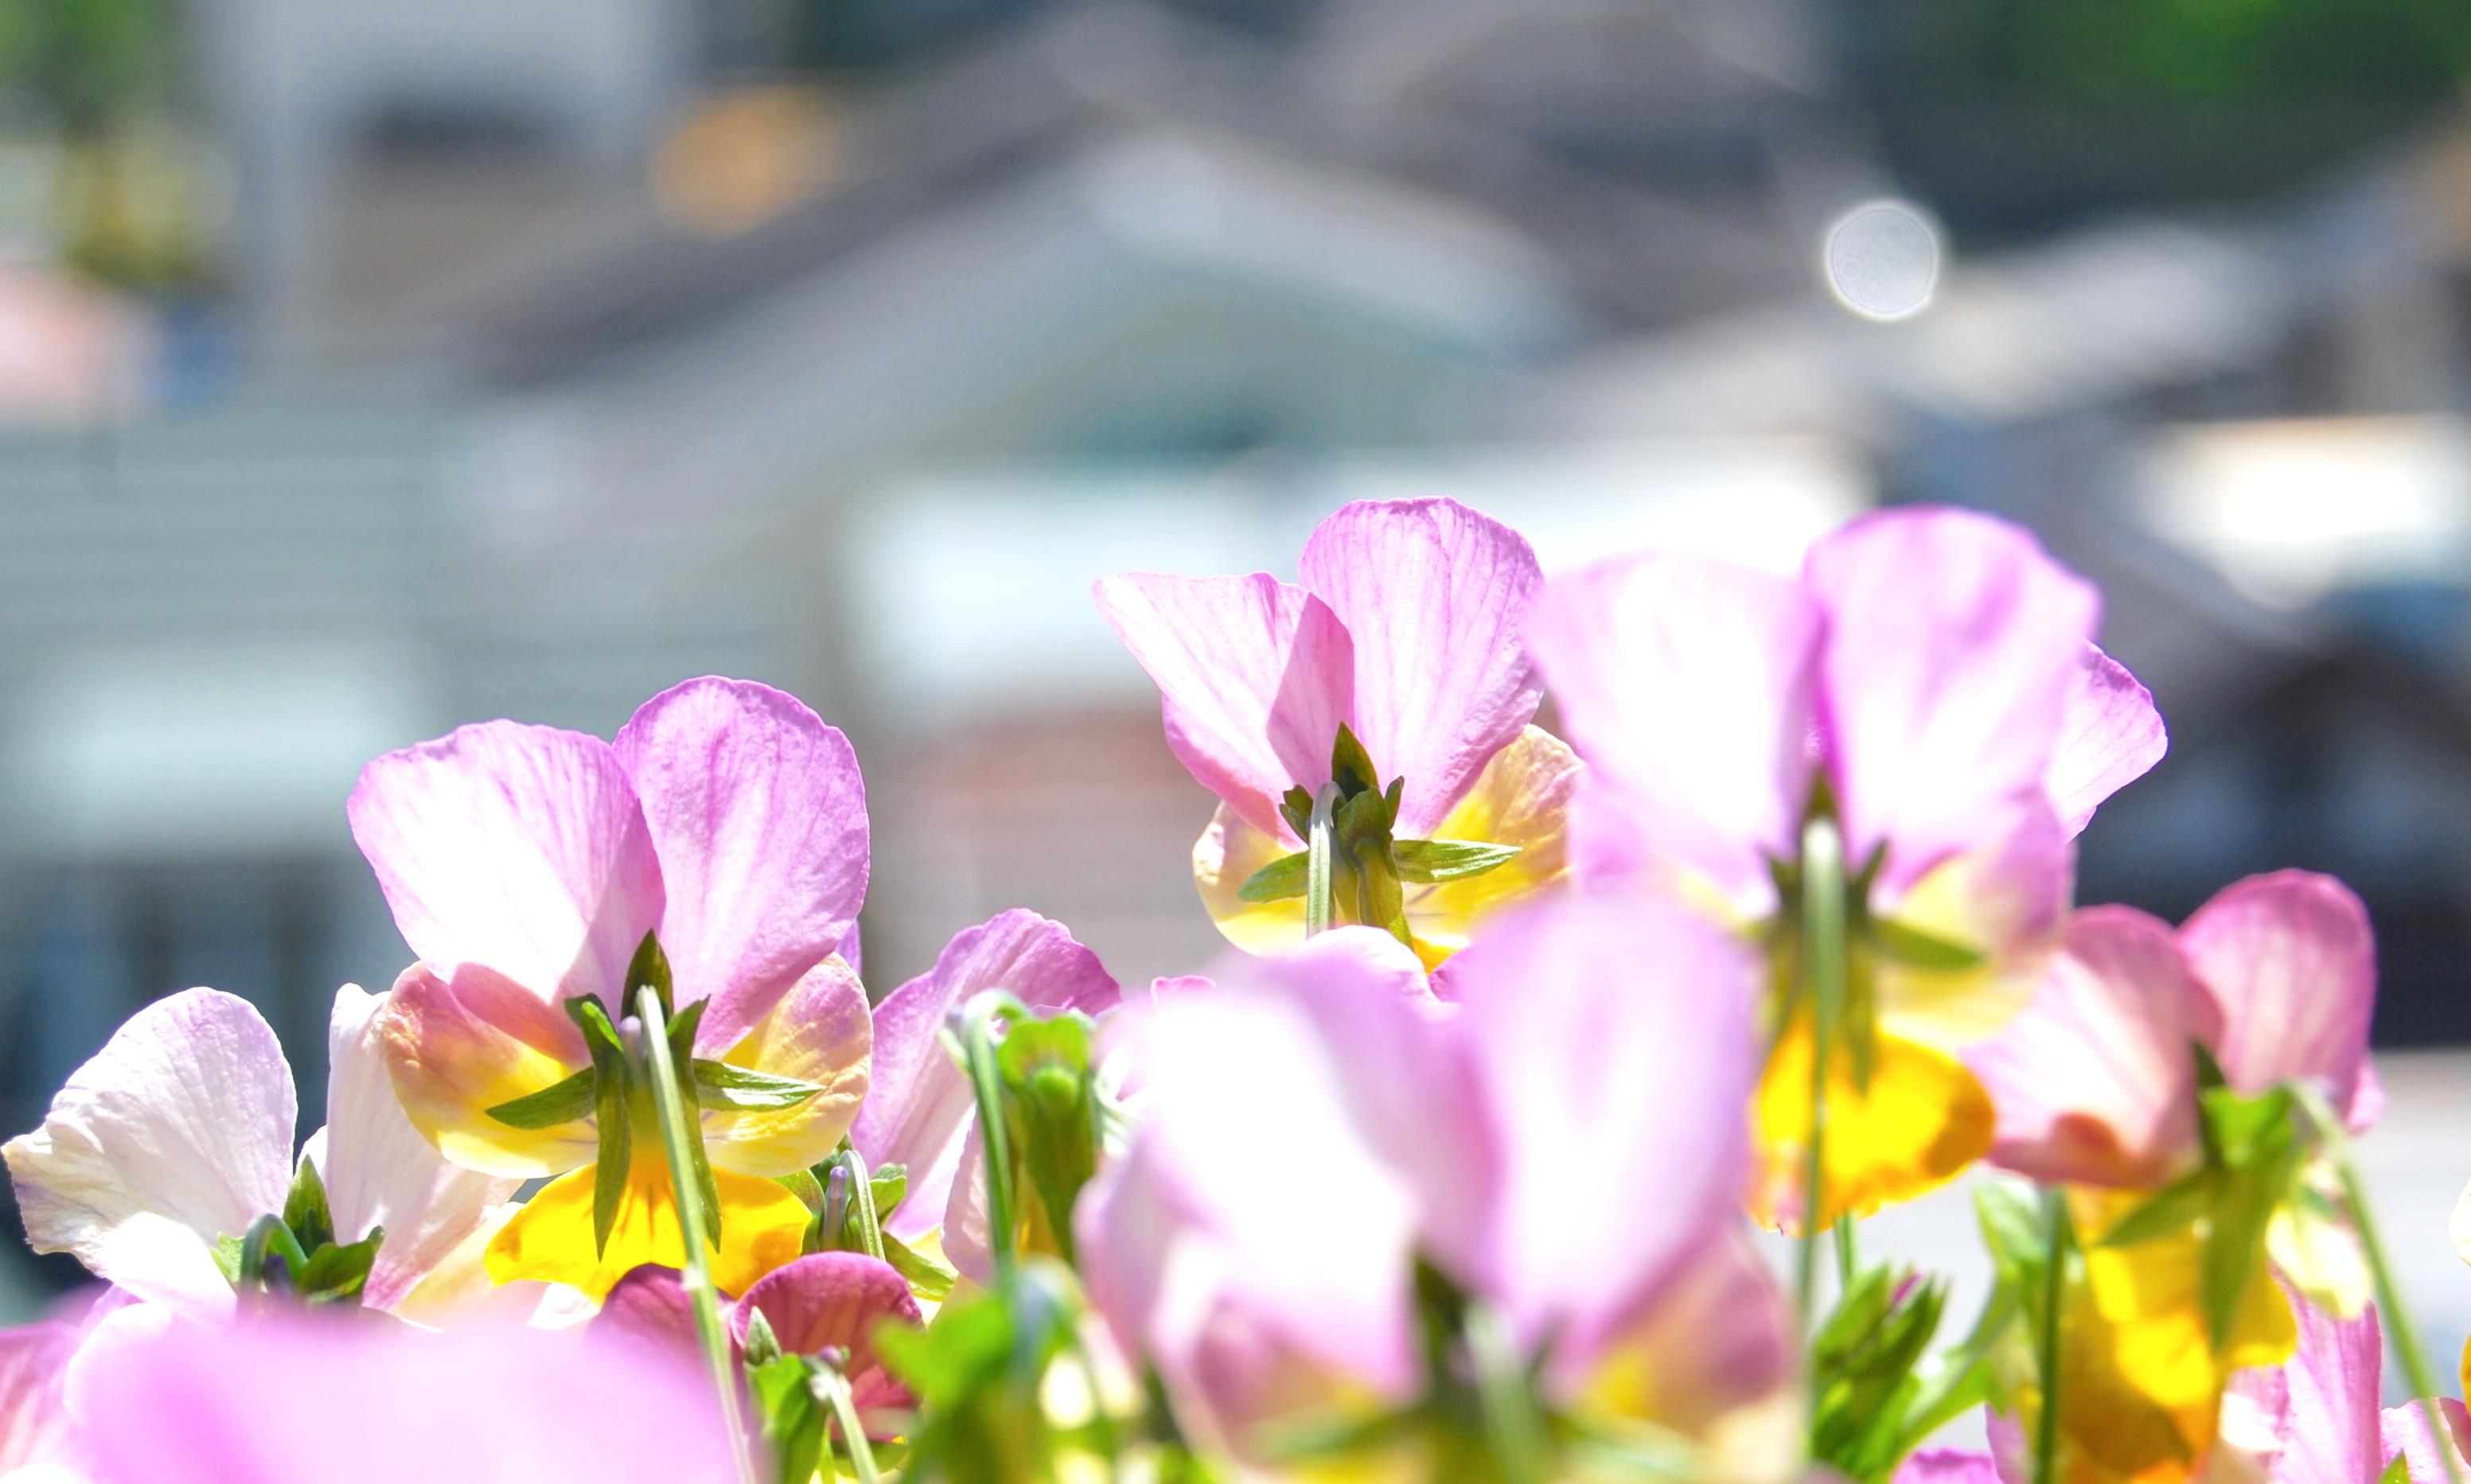 https://cdn-ak.f.st-hatena.com/images/fotolife/s/shioshiohida/20180429/20180429095544_original.jpg